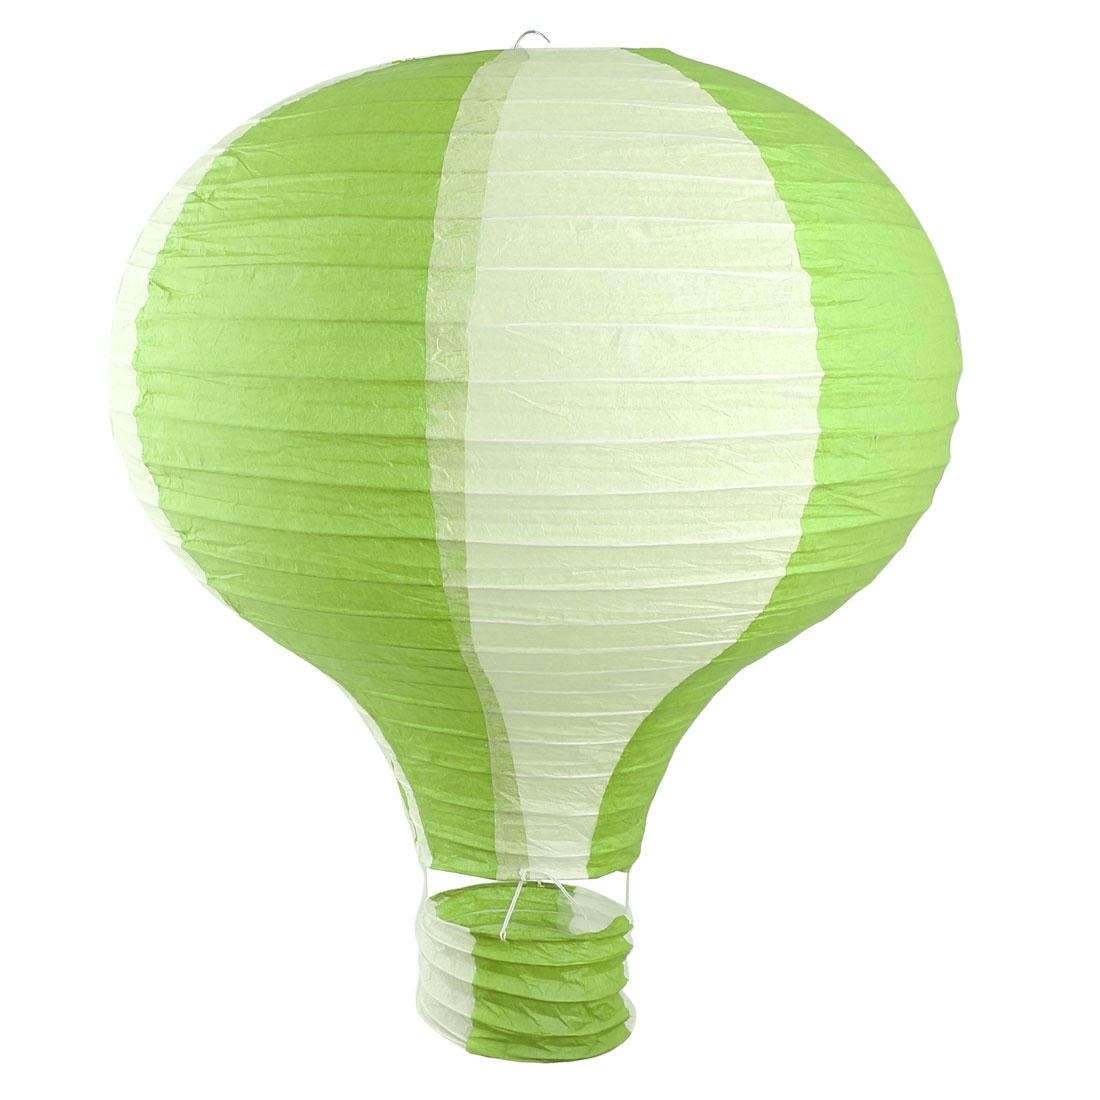 Household Party Paper Lightless Hanging DIY Decor Hot Air Balloon Lantern Light Green White 16 Inch Dia